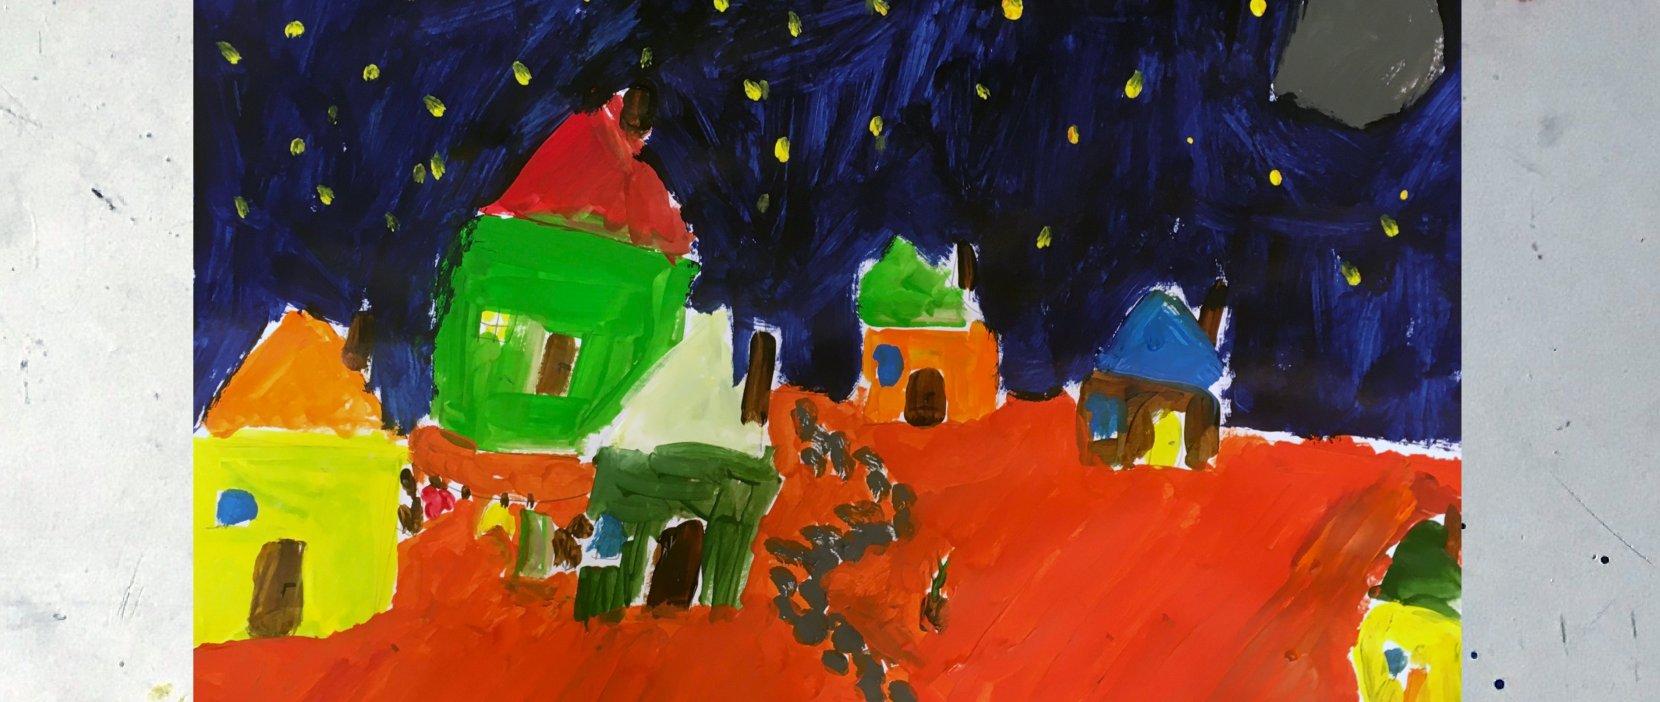 maleri ørkenby om natten